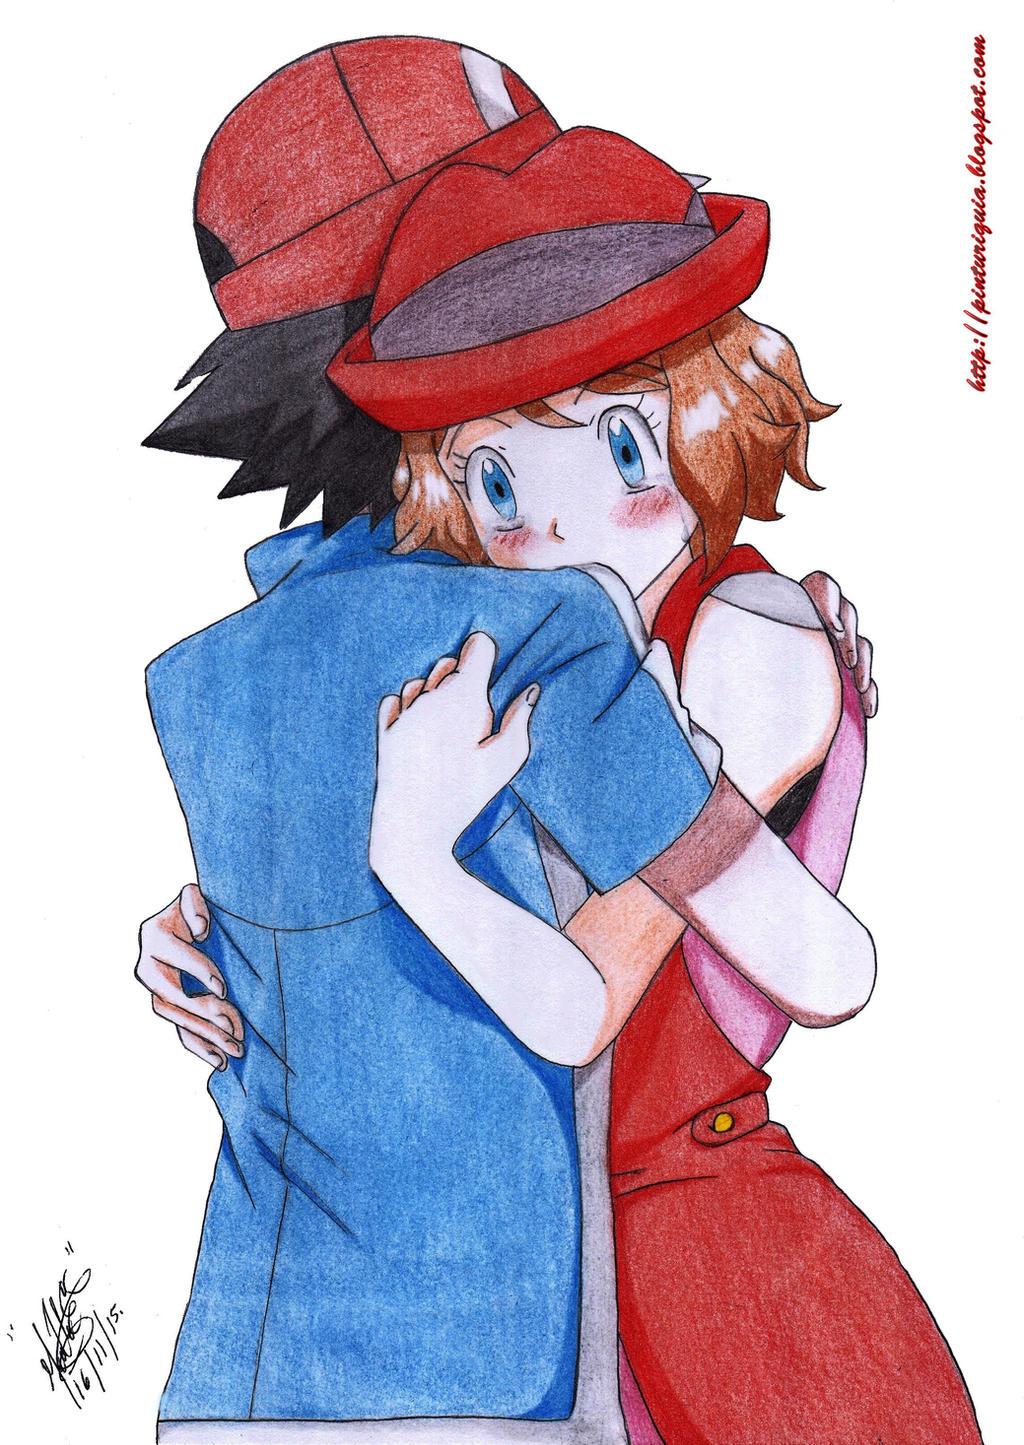 mlp pokemon ash and serena by jucamovi1992 on deviantart